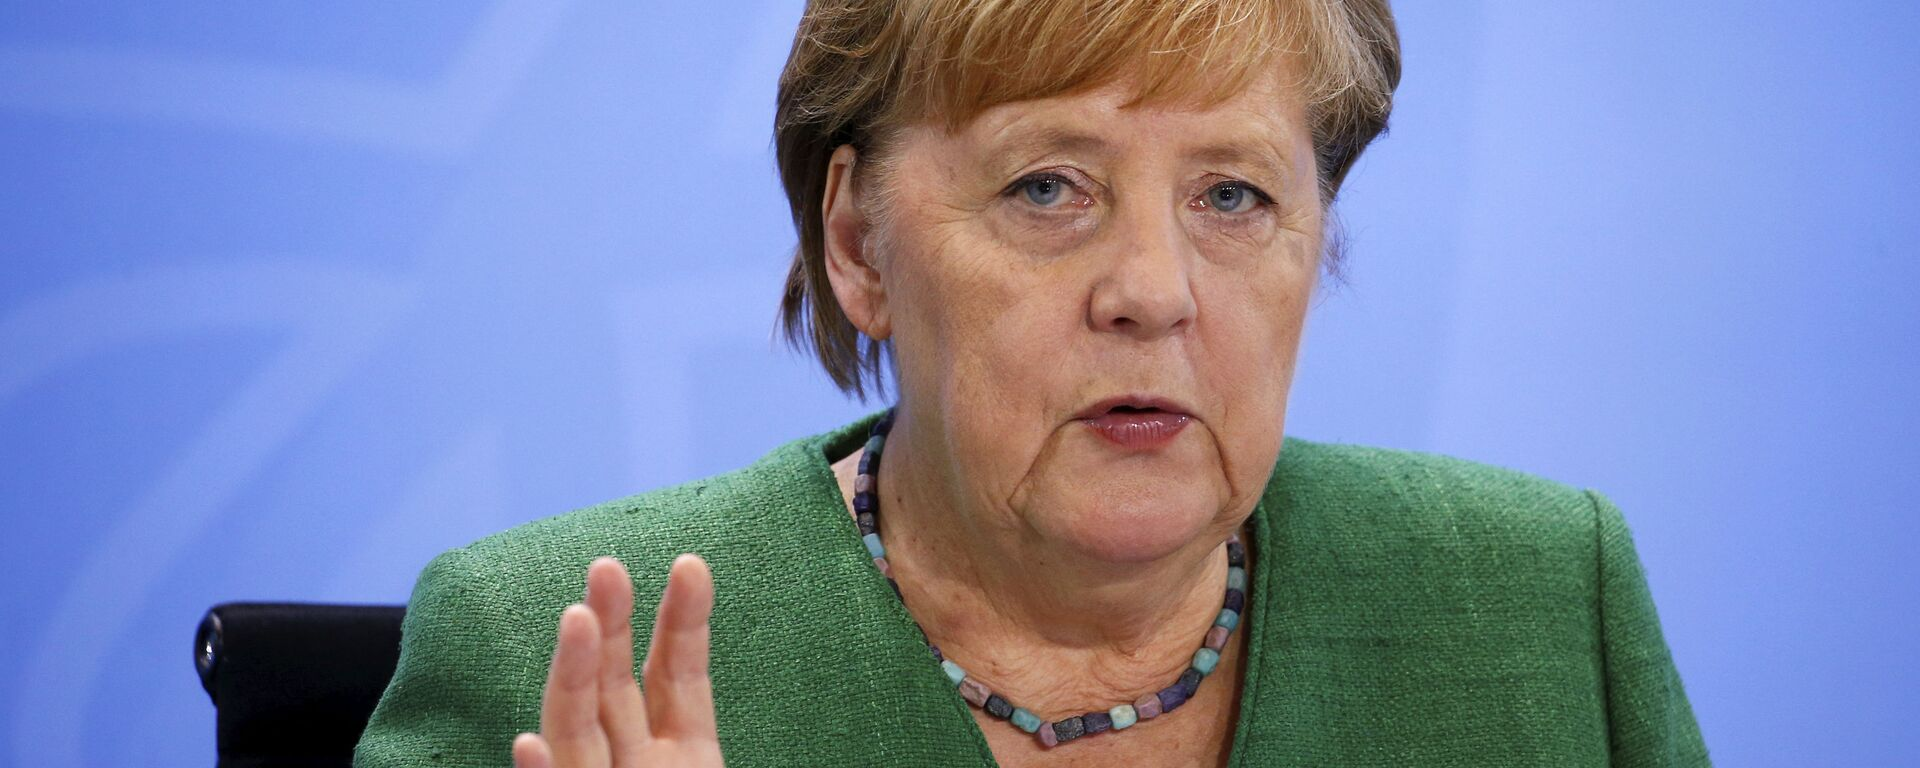 Nemačka kancelarka Angela Merkel - Sputnik Srbija, 1920, 01.09.2021